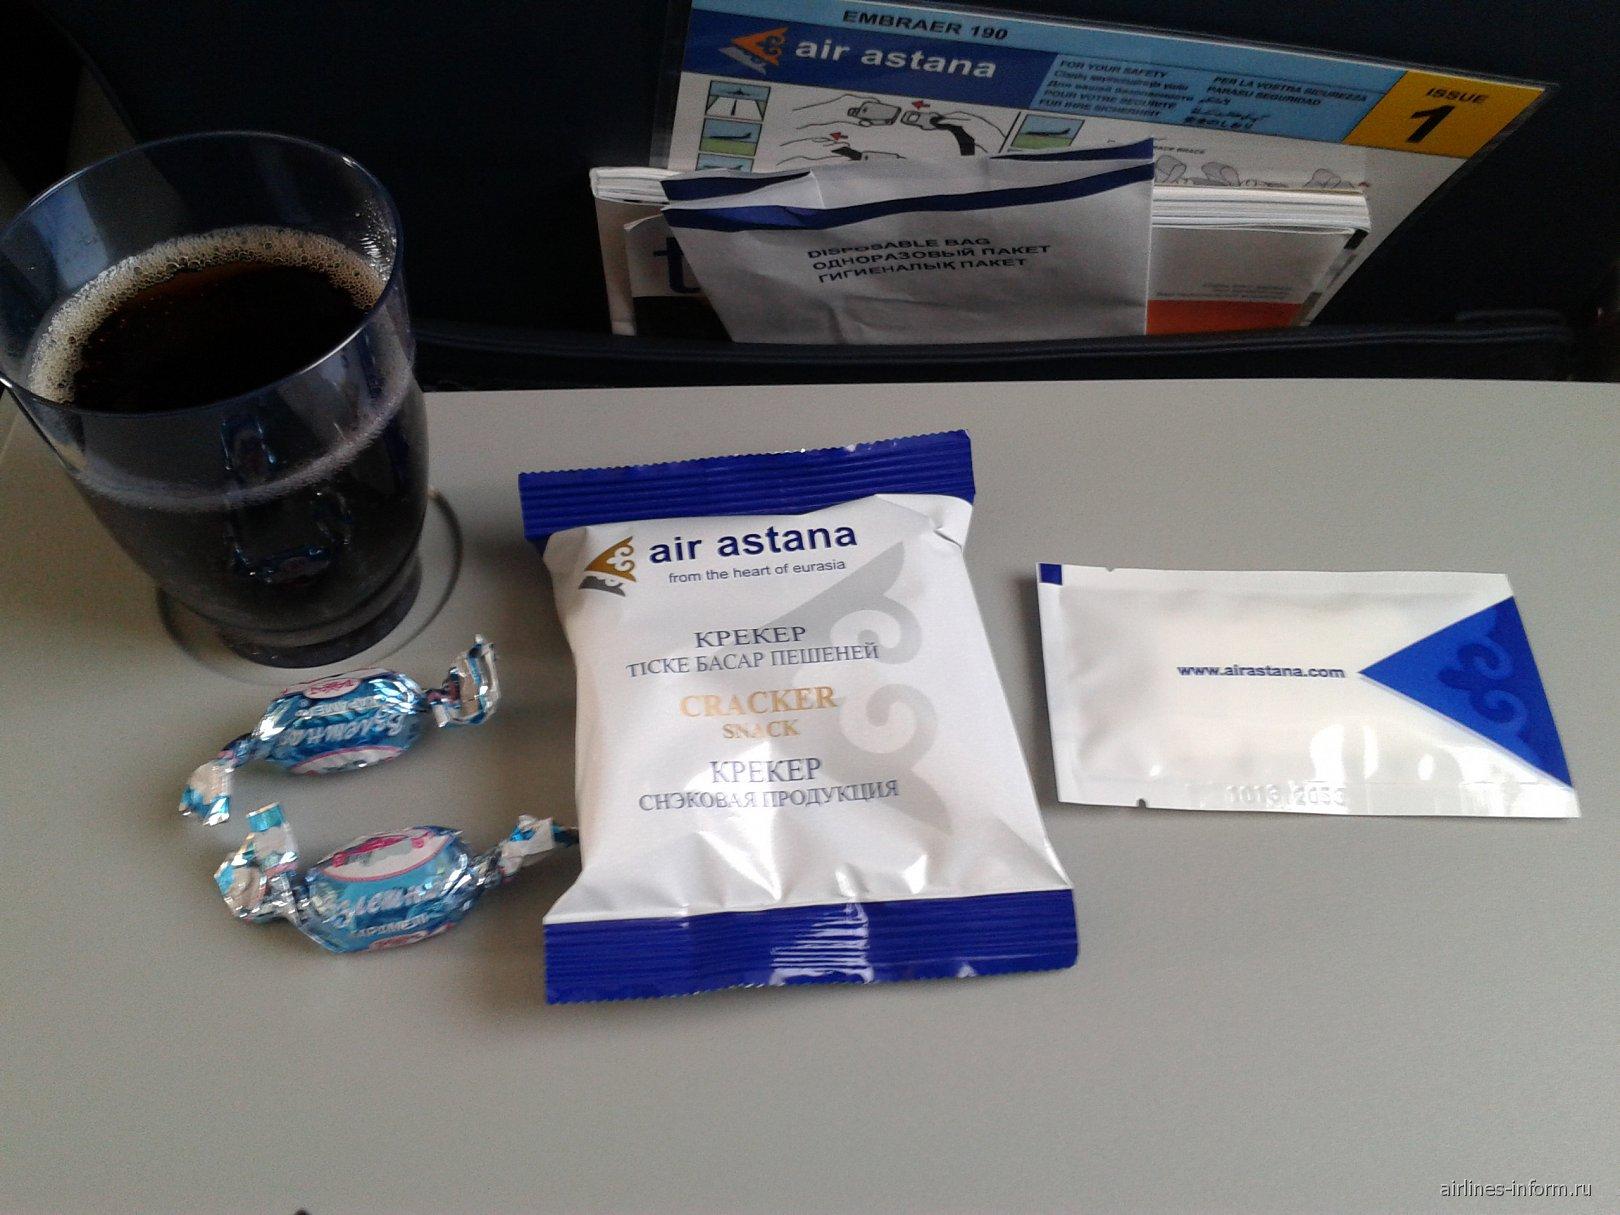 Легкое питание на рейсе Павлодар-Астана авиакомпании Air Astana